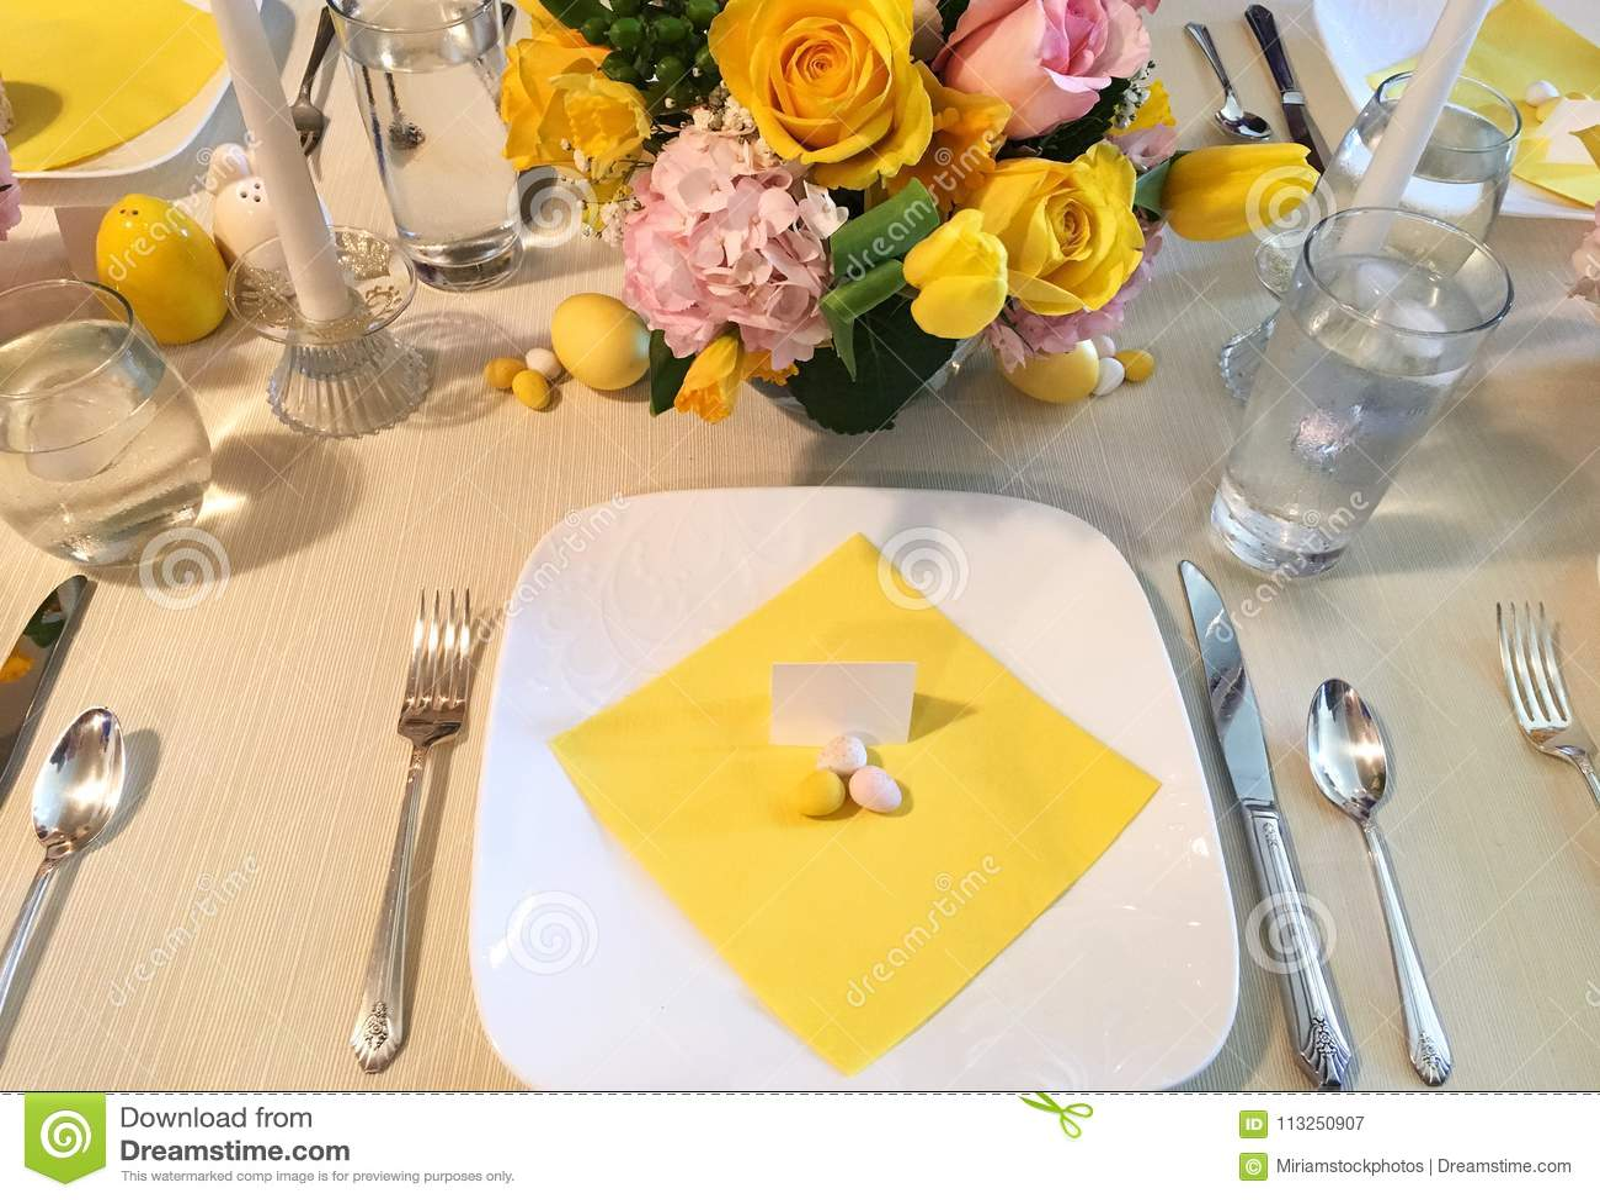 Elegant Easter Table Setting With Flowers, Dinner Plates